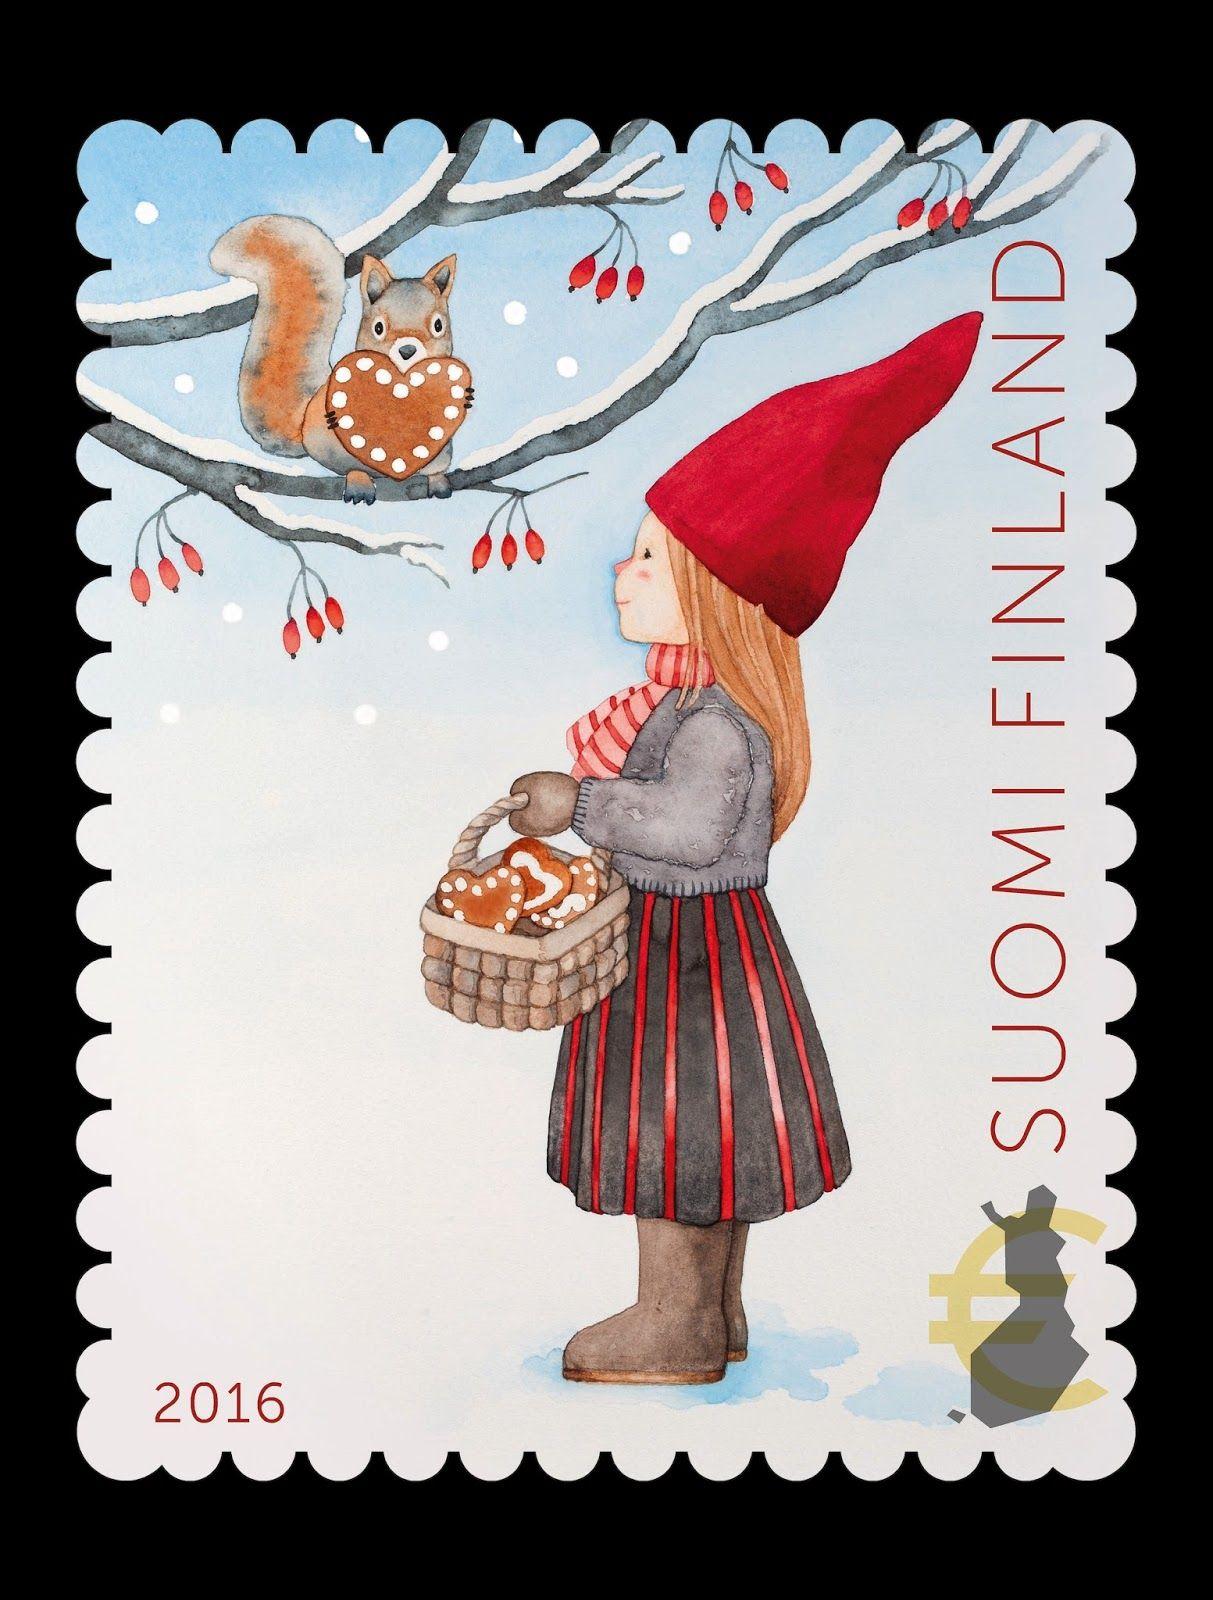 joulupostimerkki 2016 christmas postage